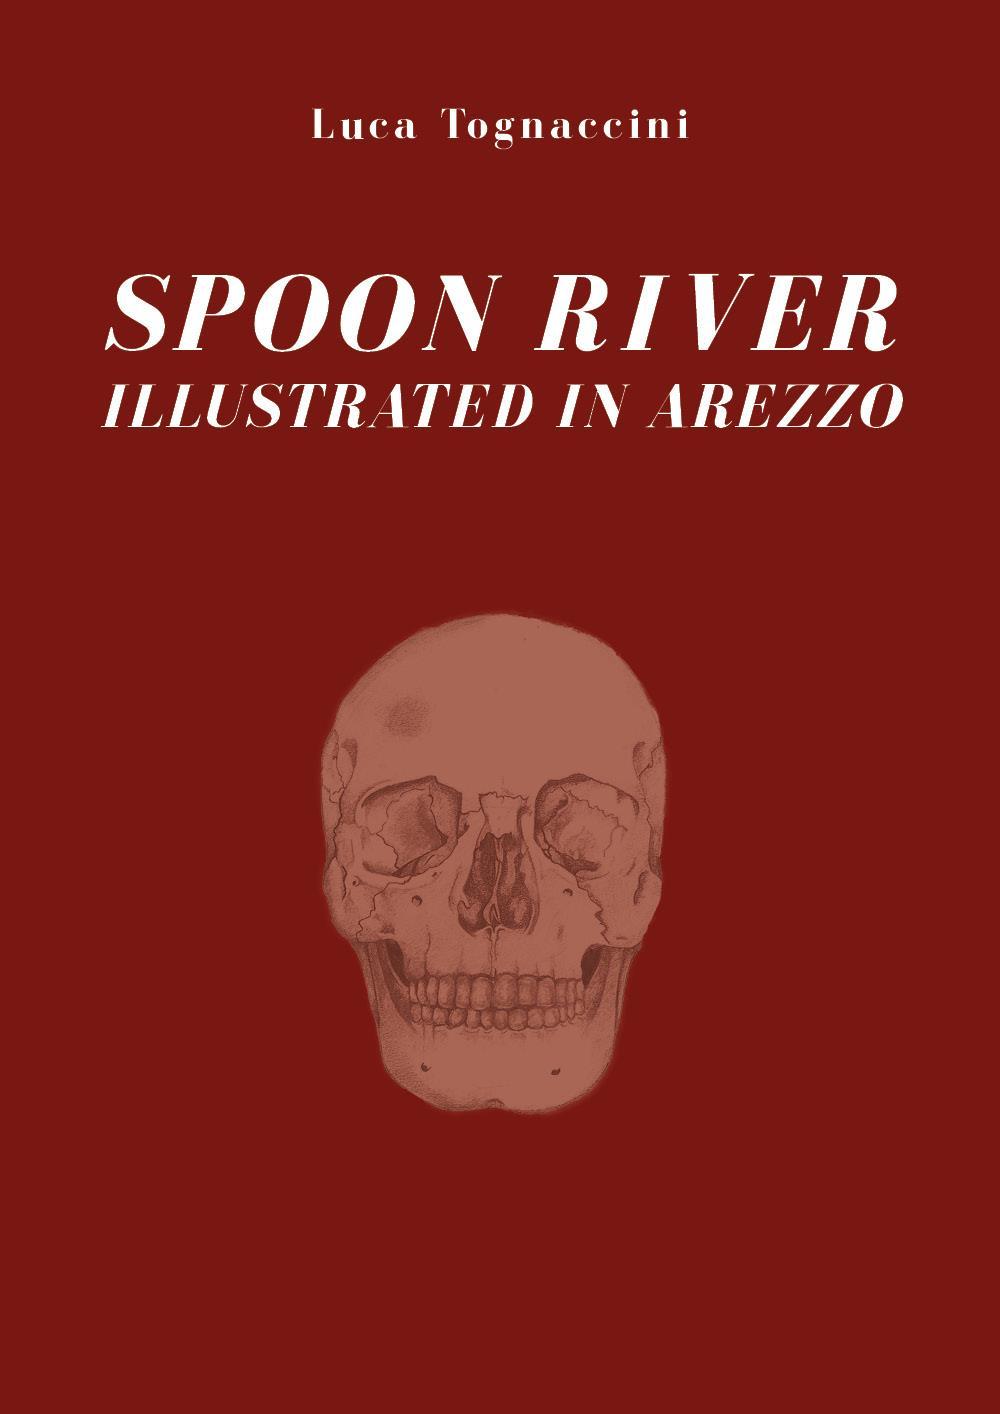 Spoon river illustrated in Arezzo